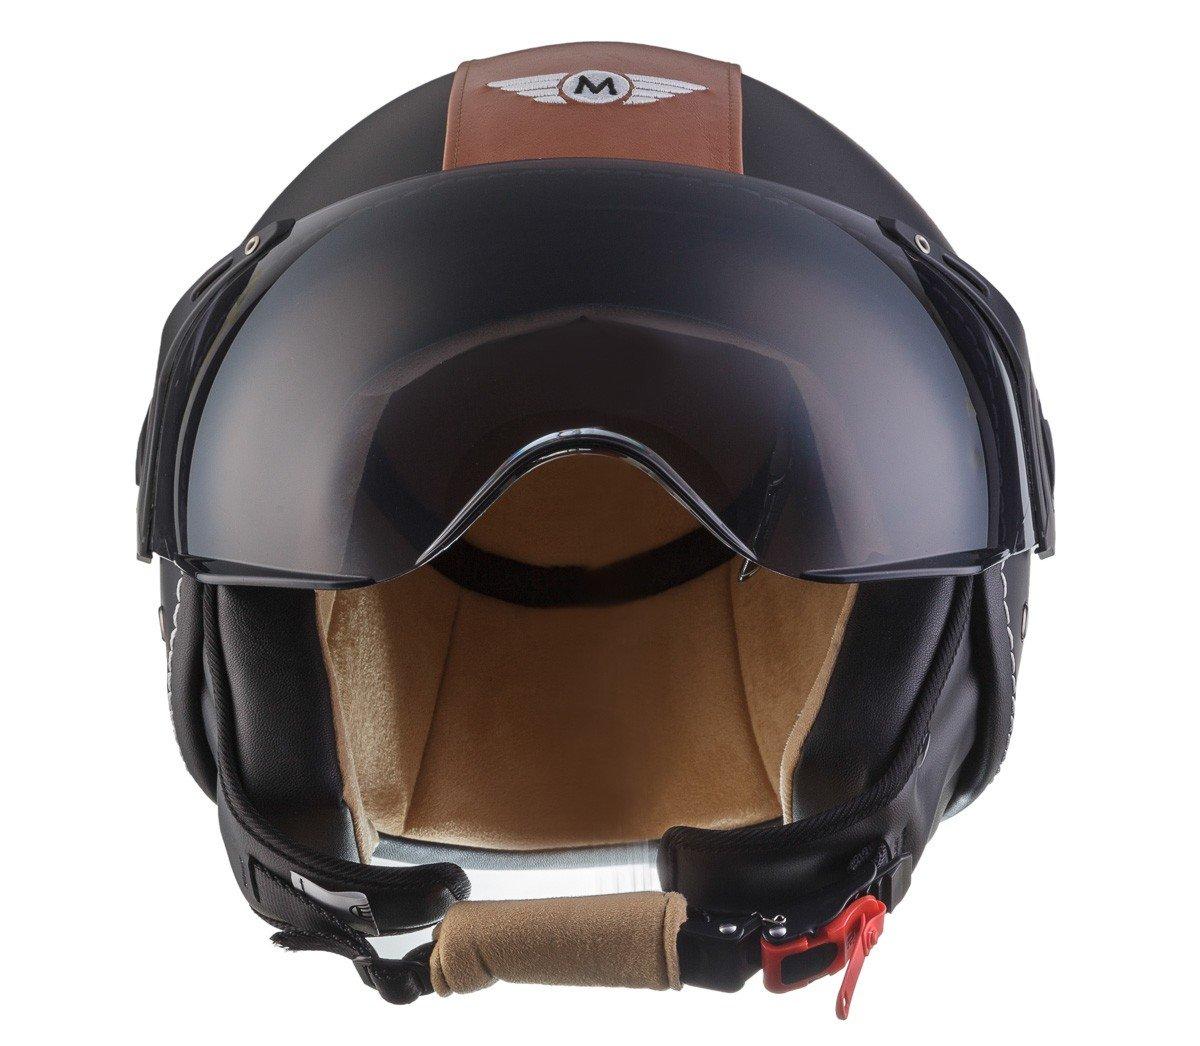 59-60cm L Blanc Mat Moto Helmets H44 Bobber Vintage Chopper Demi-Jet Helmet Scooter Chopper Pilot Retro Biker Vespa Moto Mofa Casque Jet Cruiser